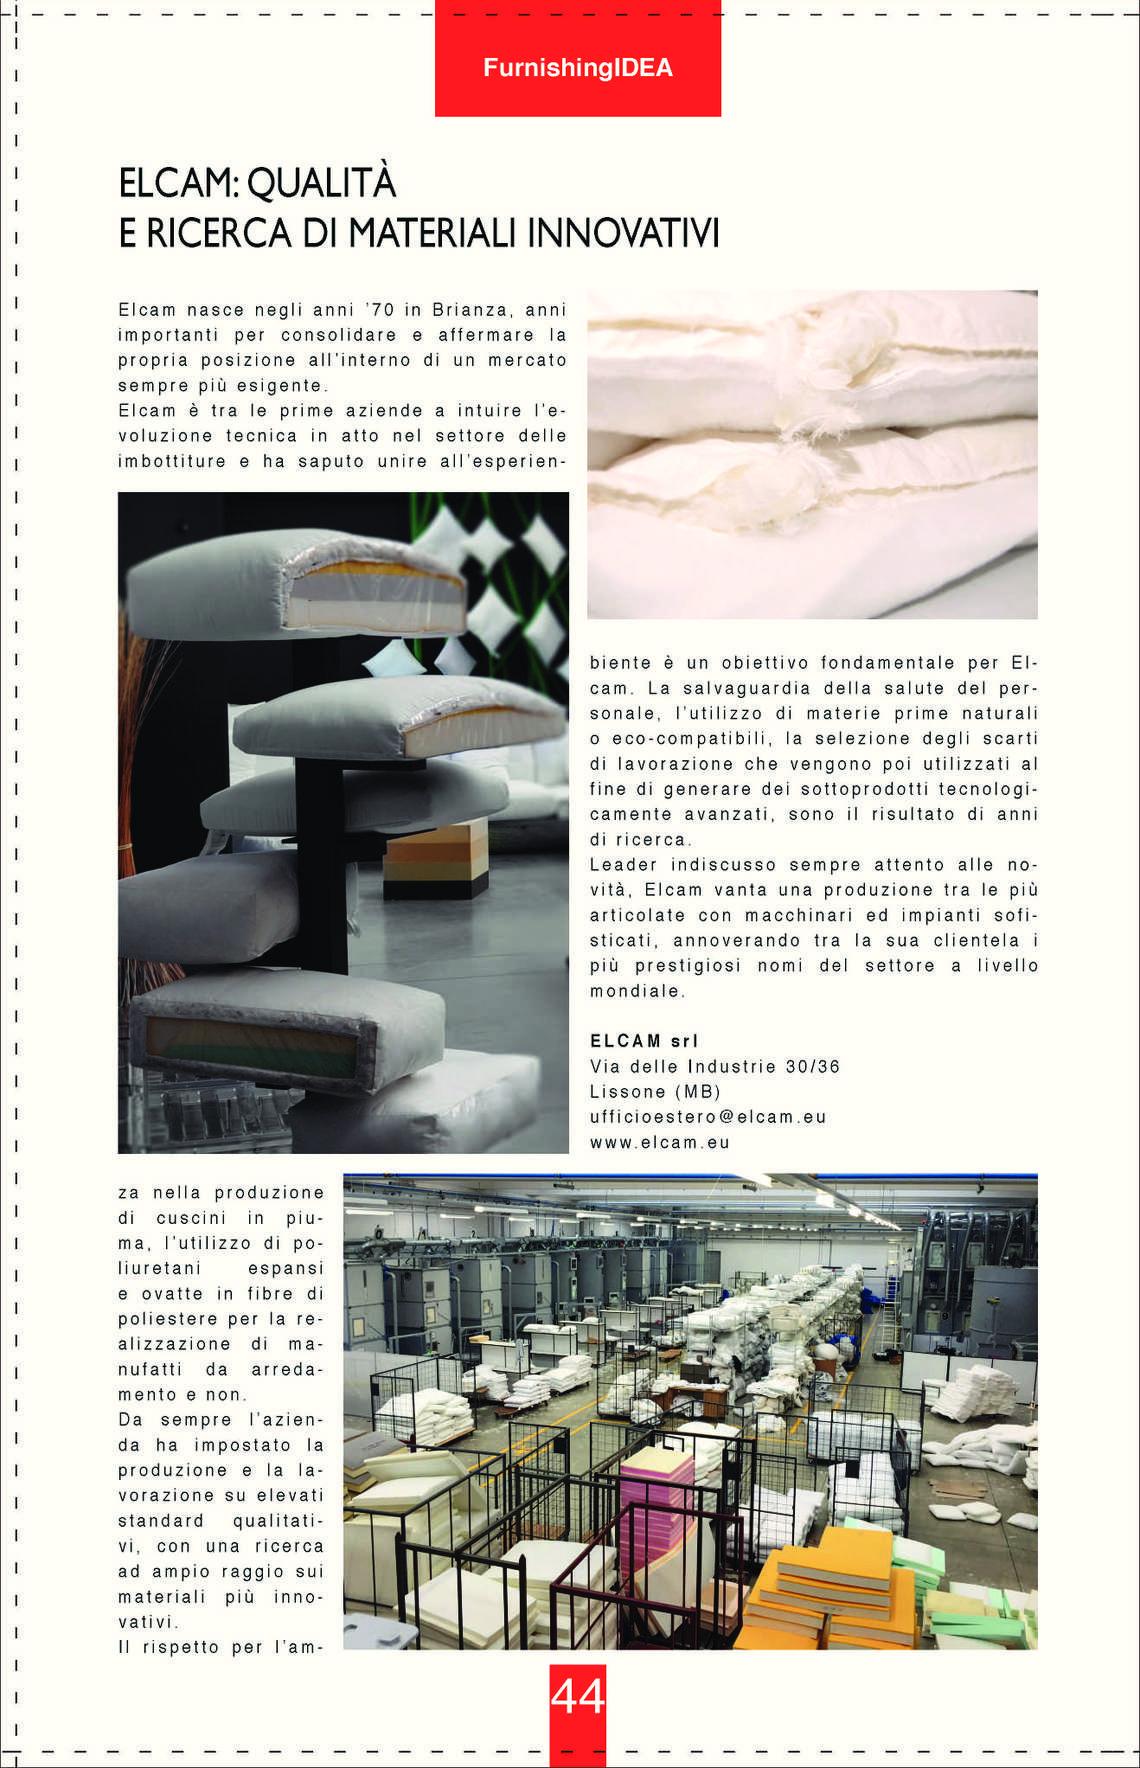 furnishing-idea-journal--1-2018_journal_9_043.jpg